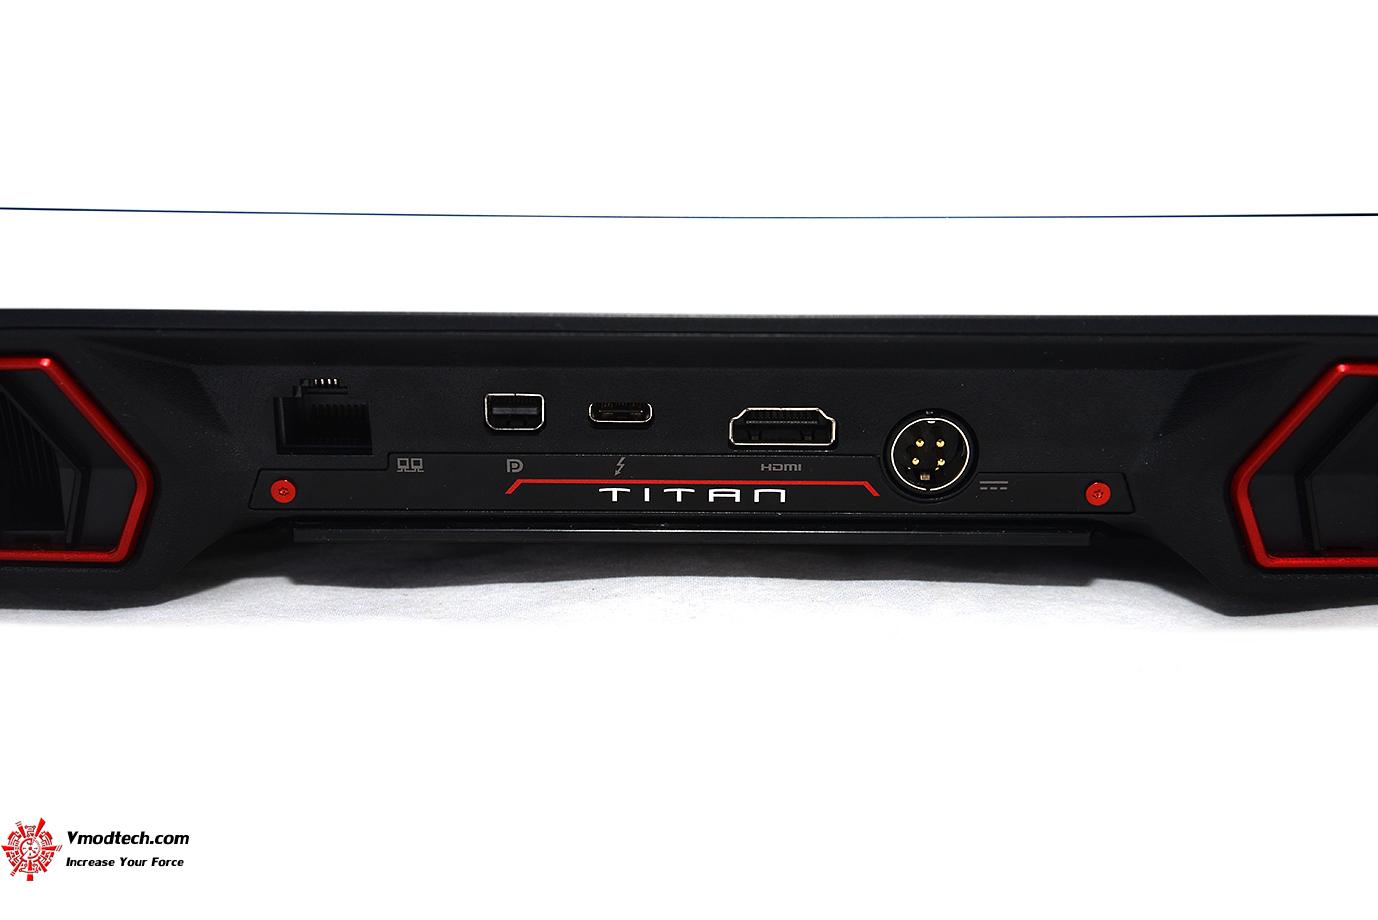 dsc 4758 MSI GT73VR 6RF Titan Pro Review